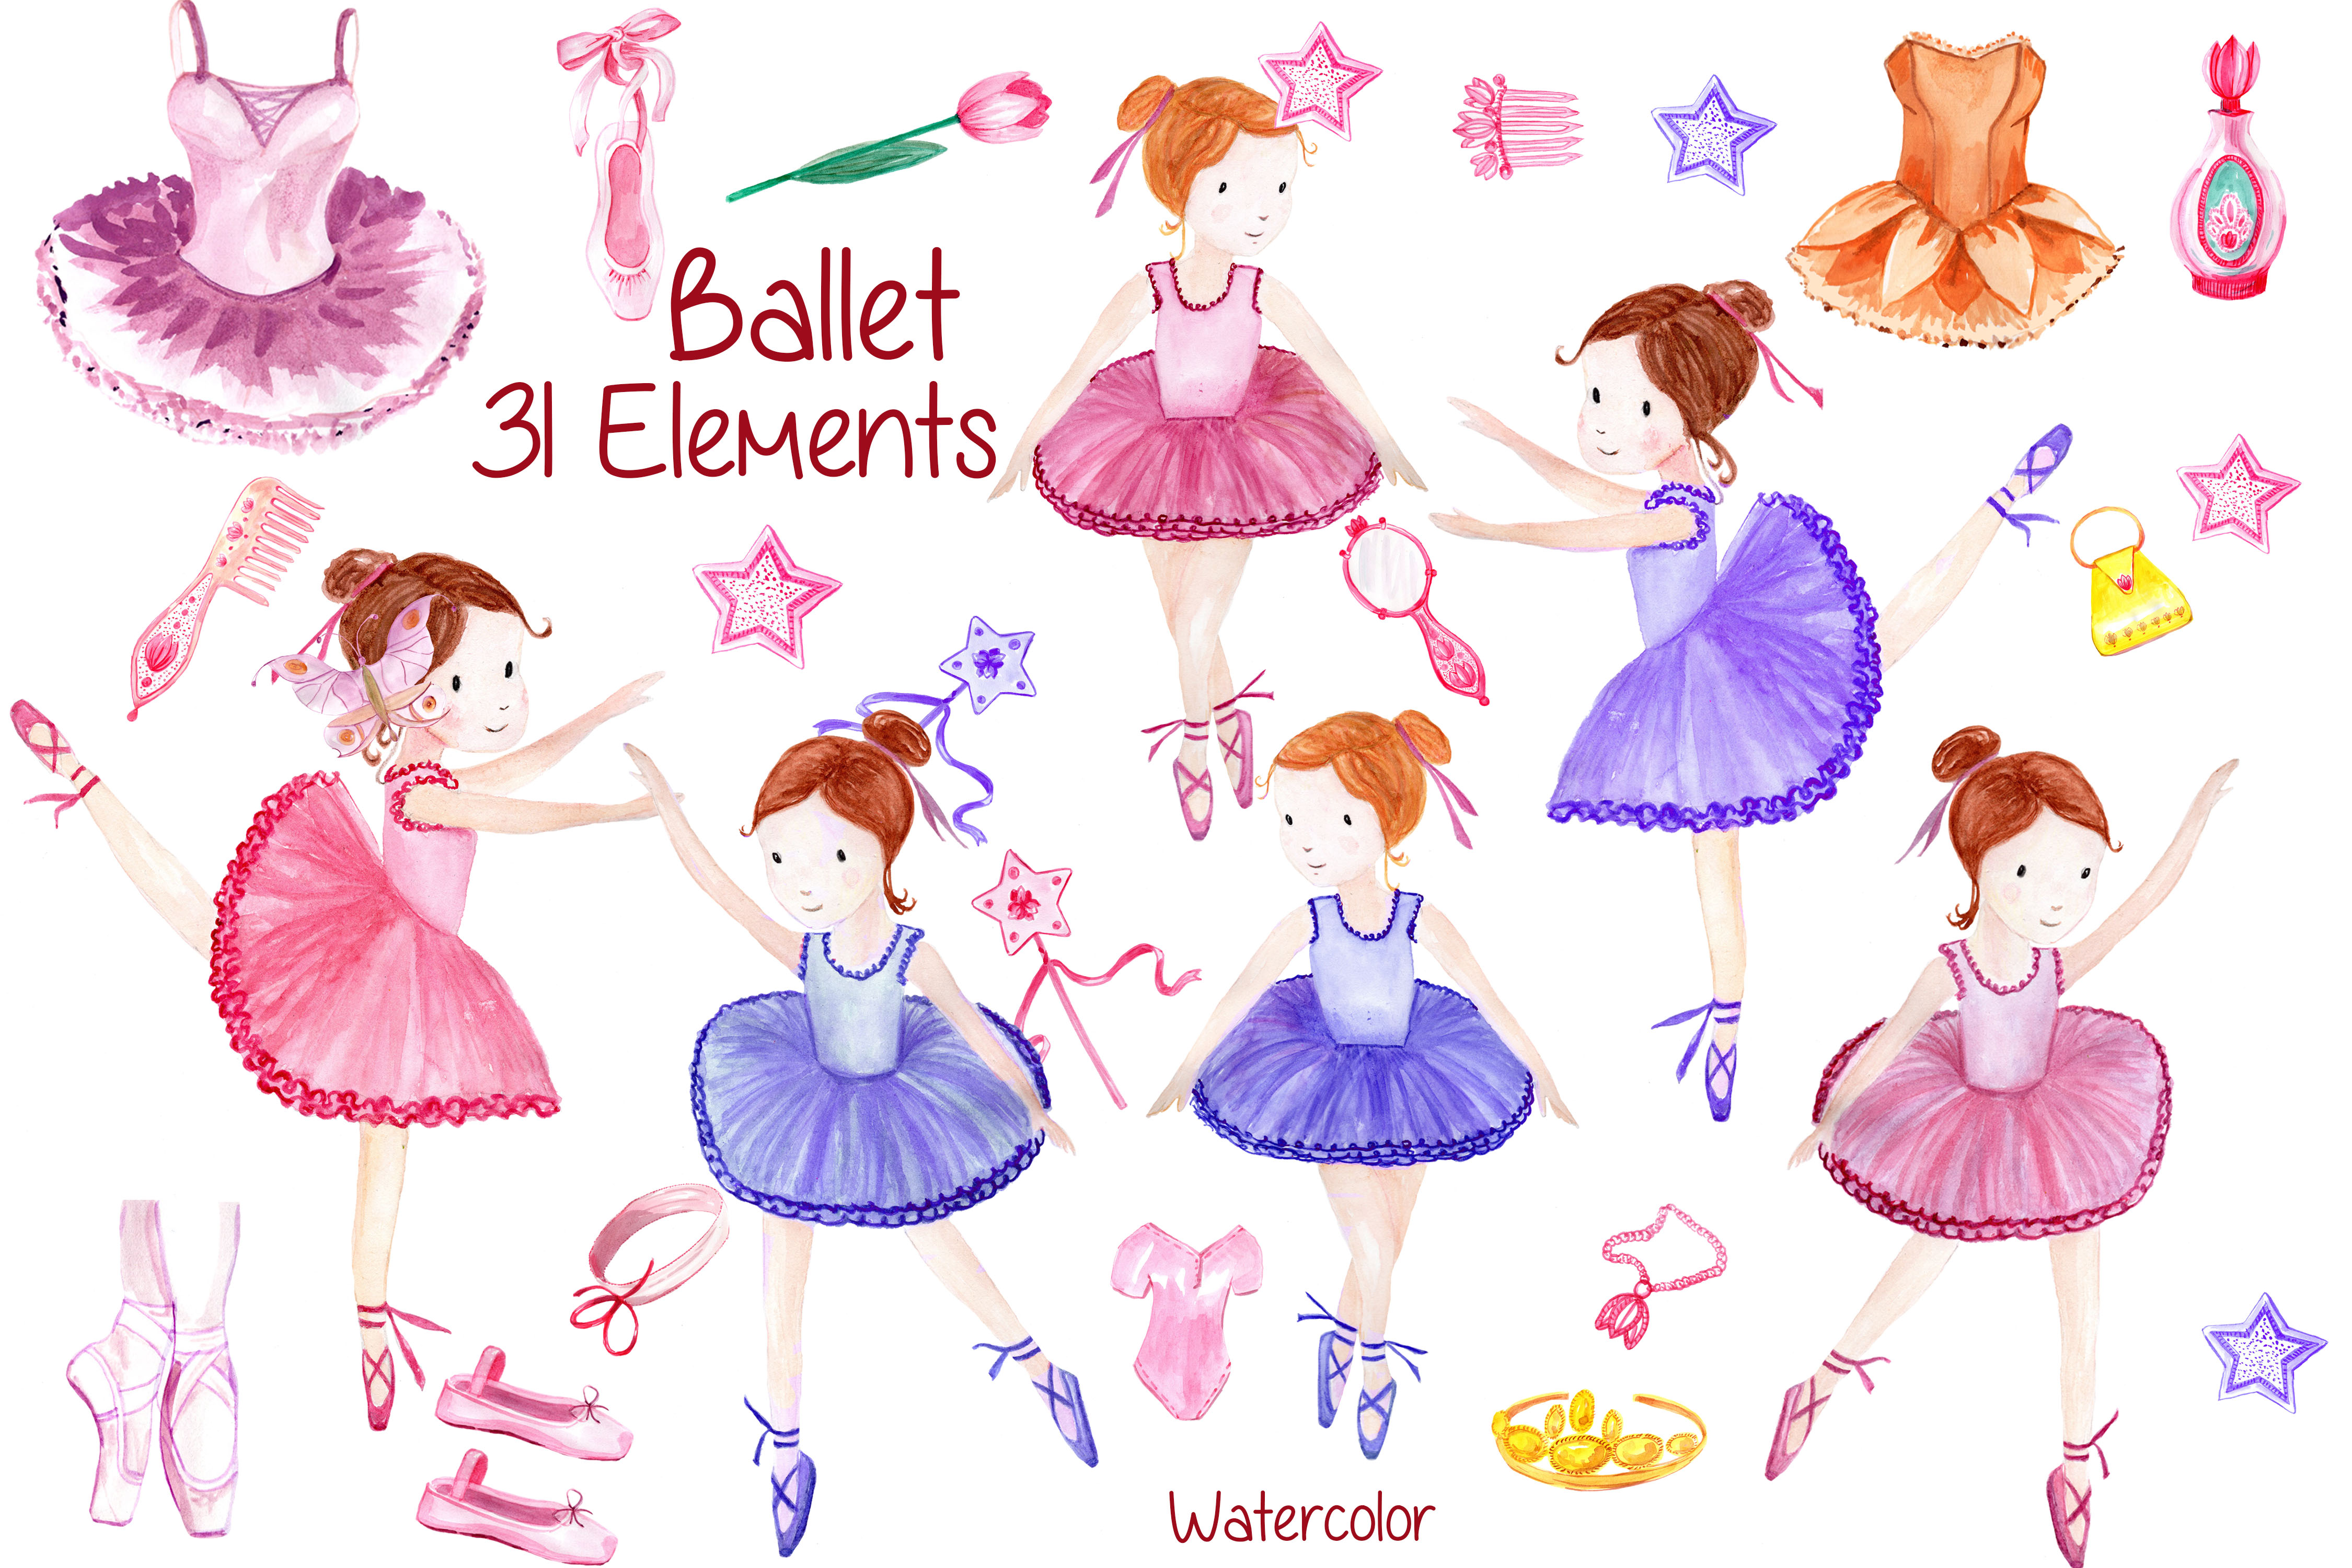 Watercolor ballerina clipart example image 1